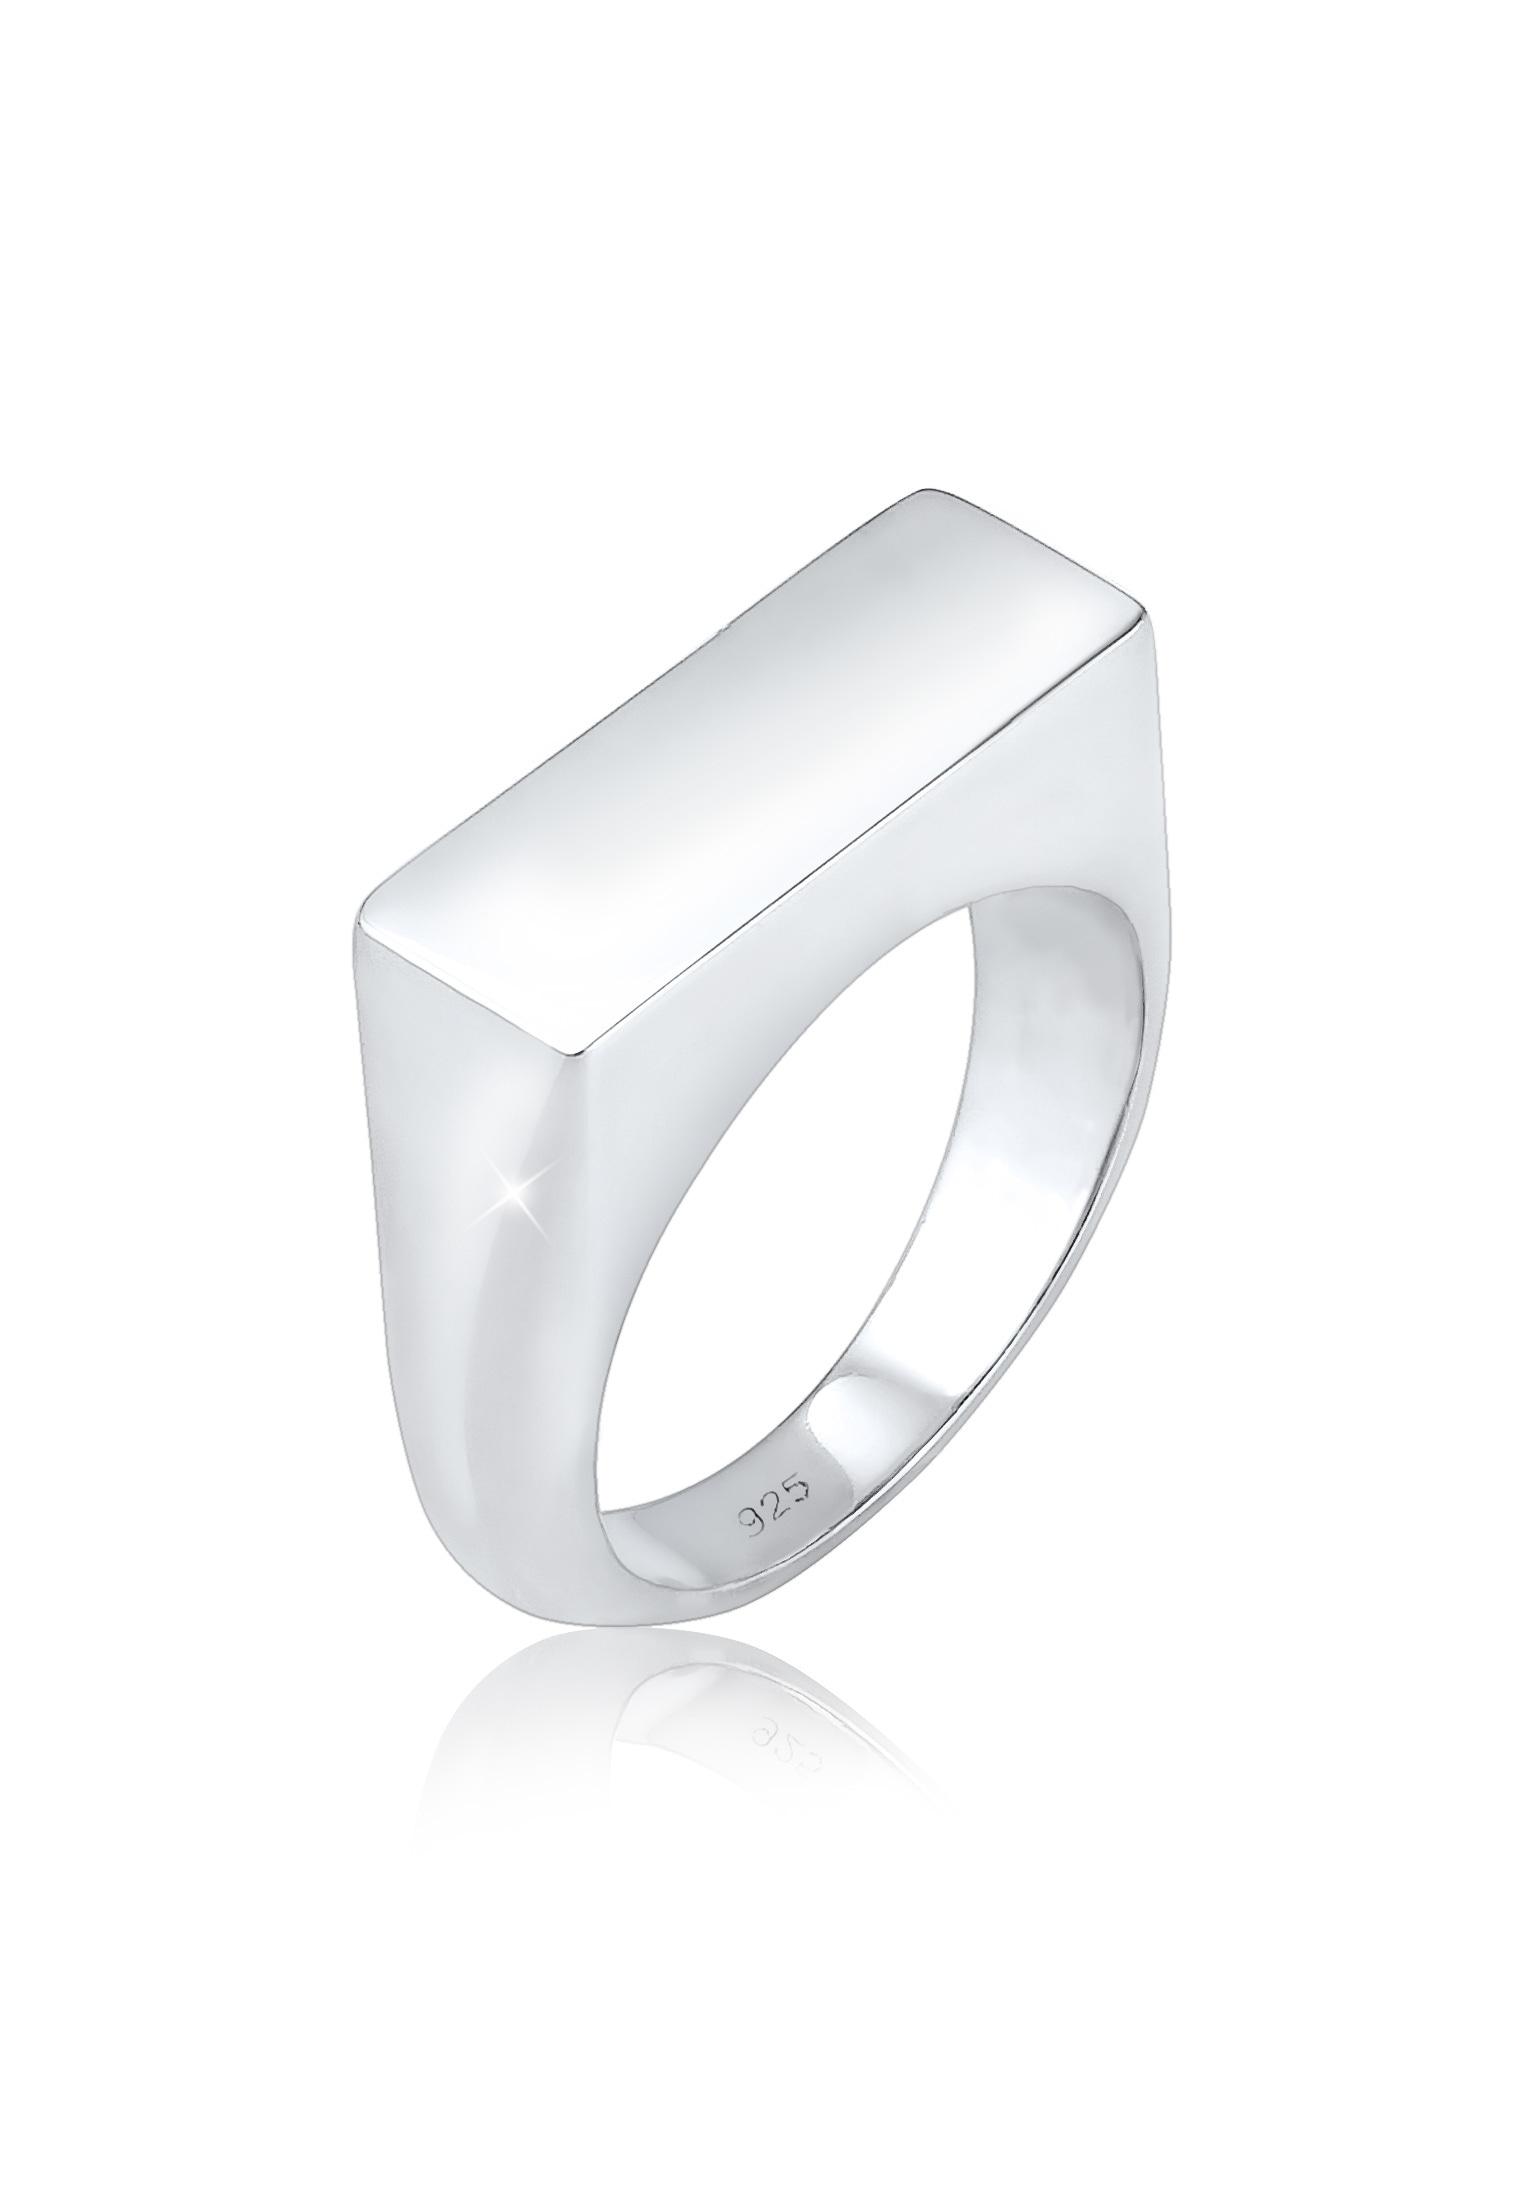 Elli Fingerring Siegelring Matt Schlicht Trend 925 Silber | Schmuck > Ringe > Fingerringe | Elli